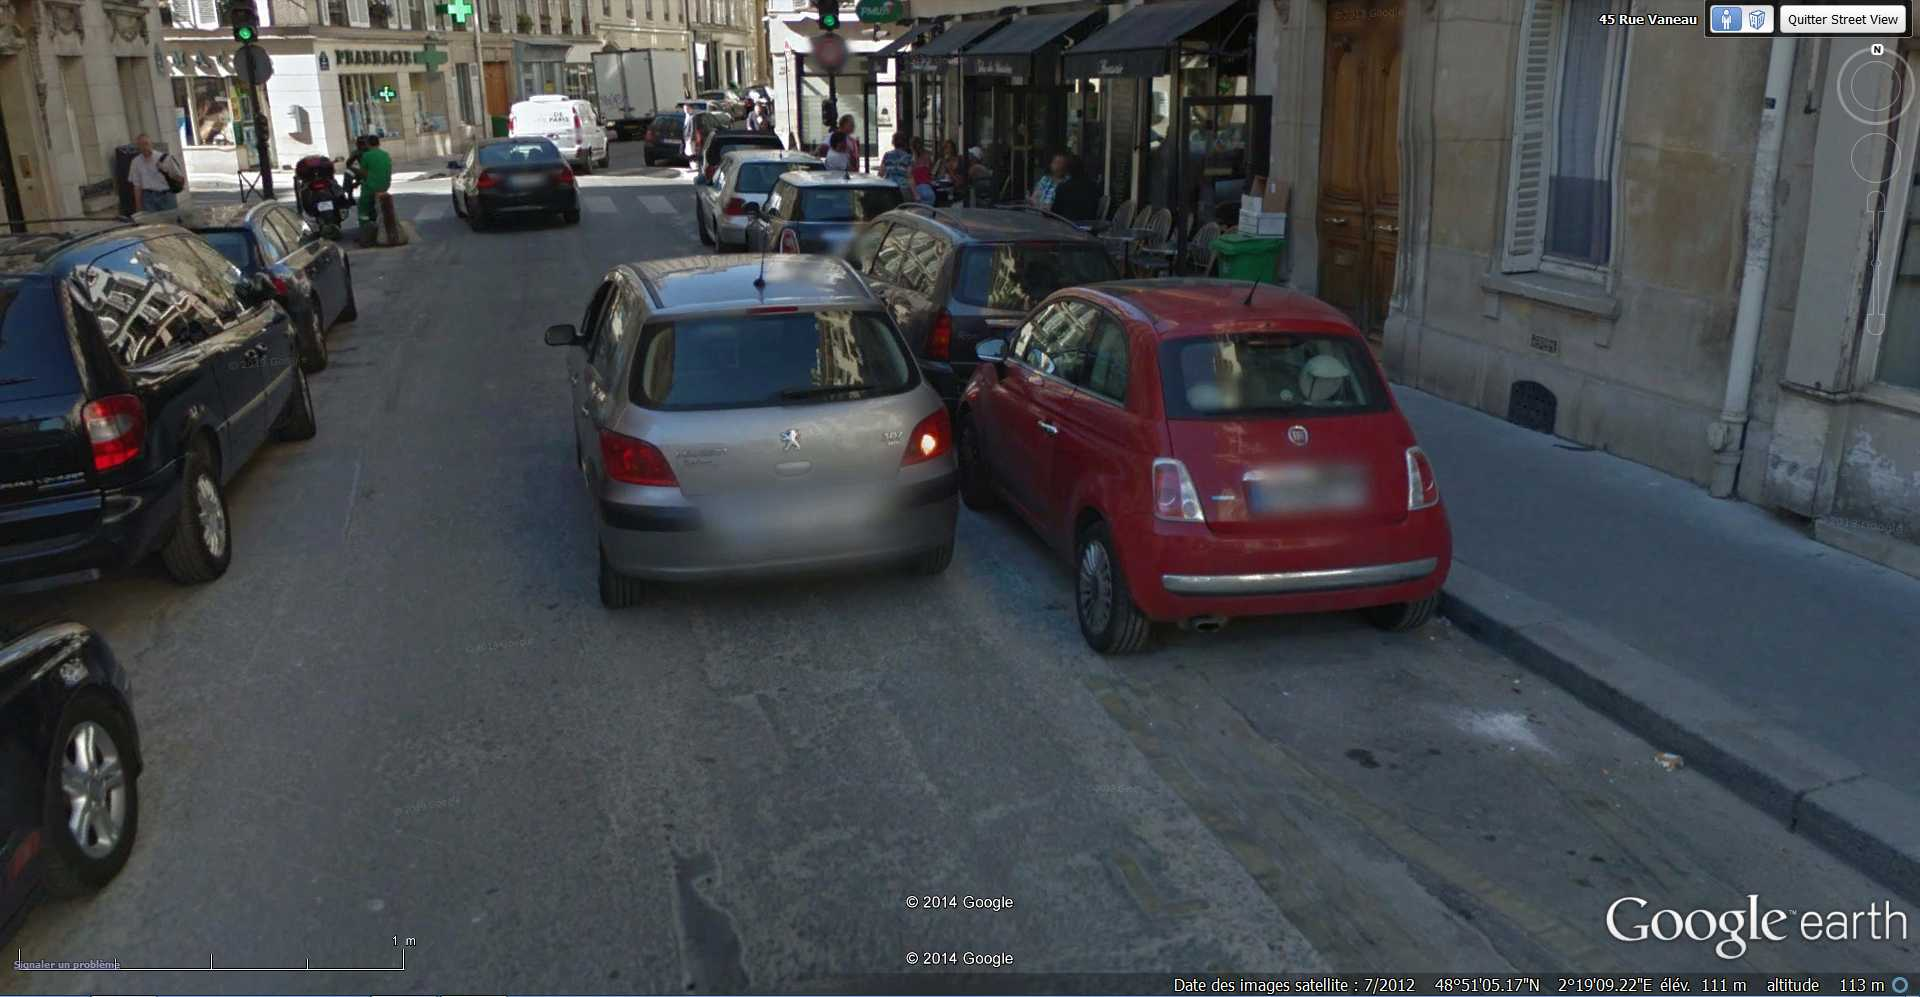 STREET VIEW : Chute de moto - rue Vaneau - Paris - France  2014-317